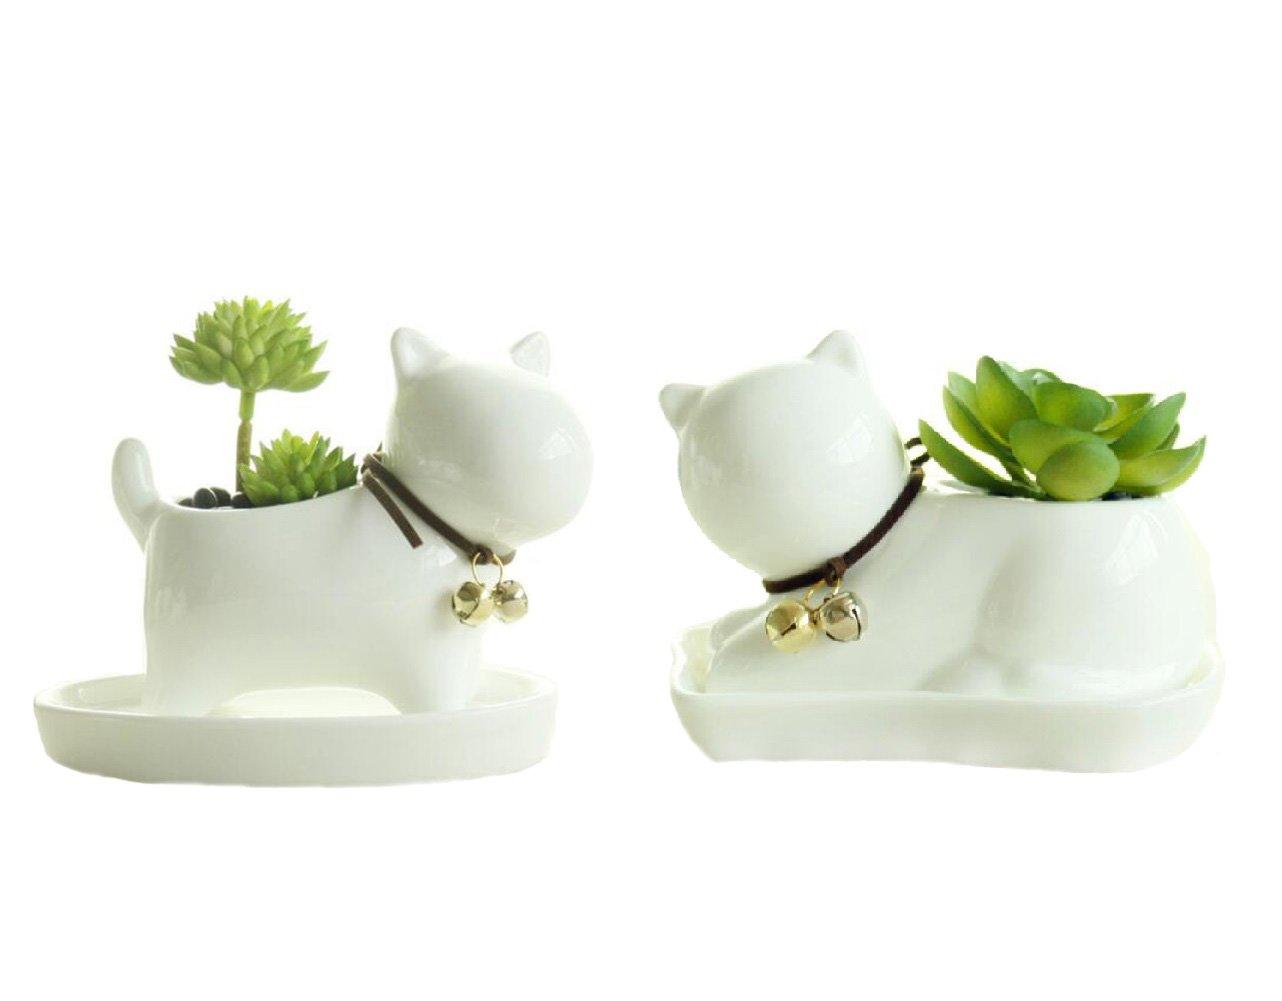 Youfui Ceramic Animal Flowerpot Succulent Plants Container Desk Mini Ornaments Dog Cat